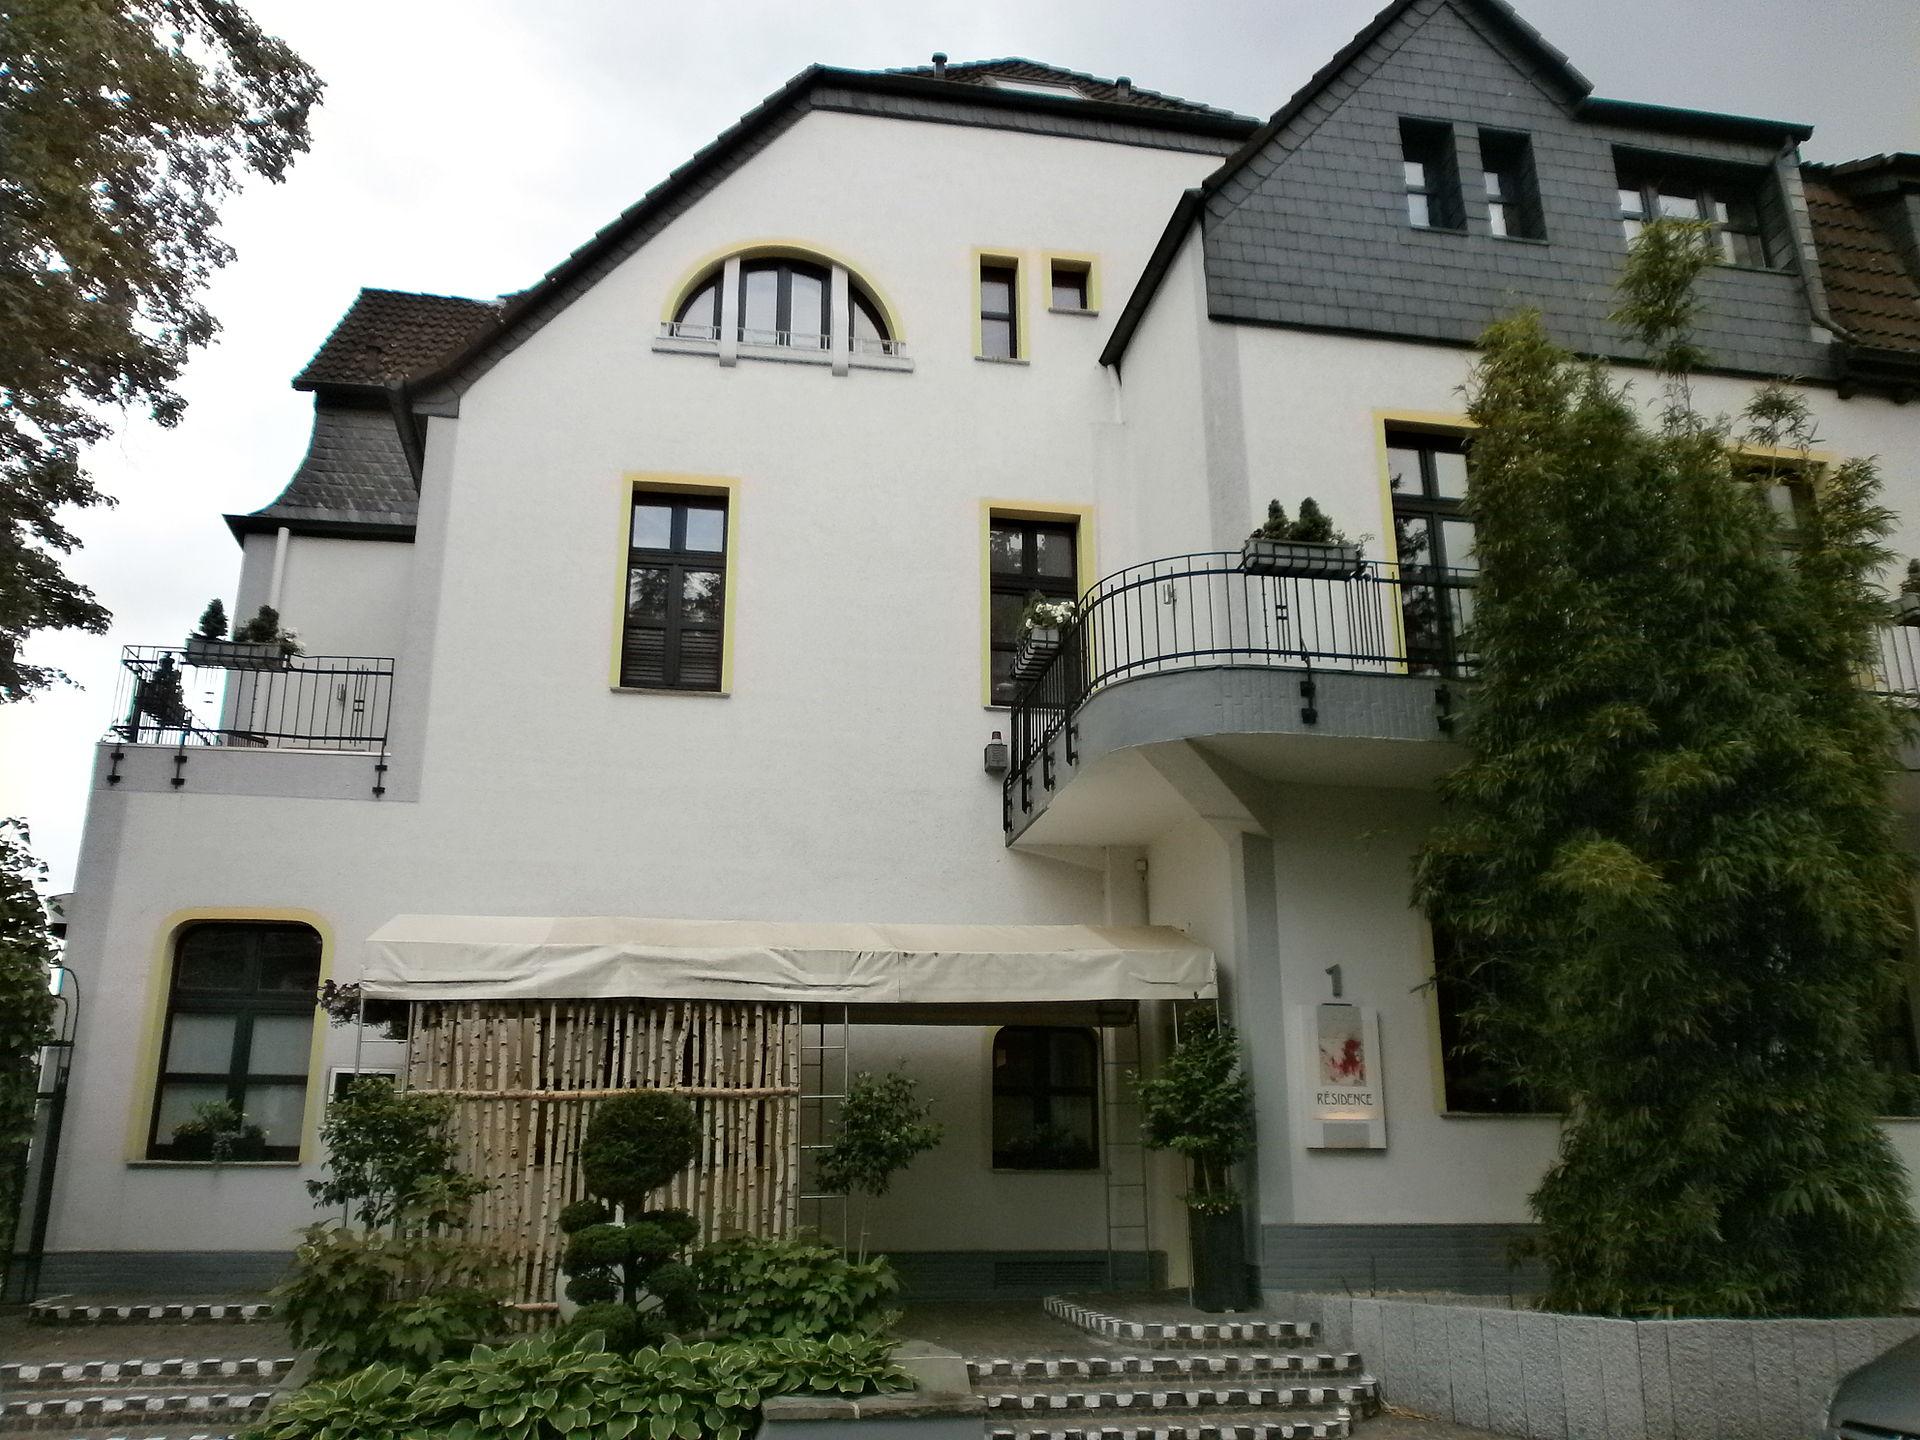 Hotel Restaurant Residence In Essen Kettwig